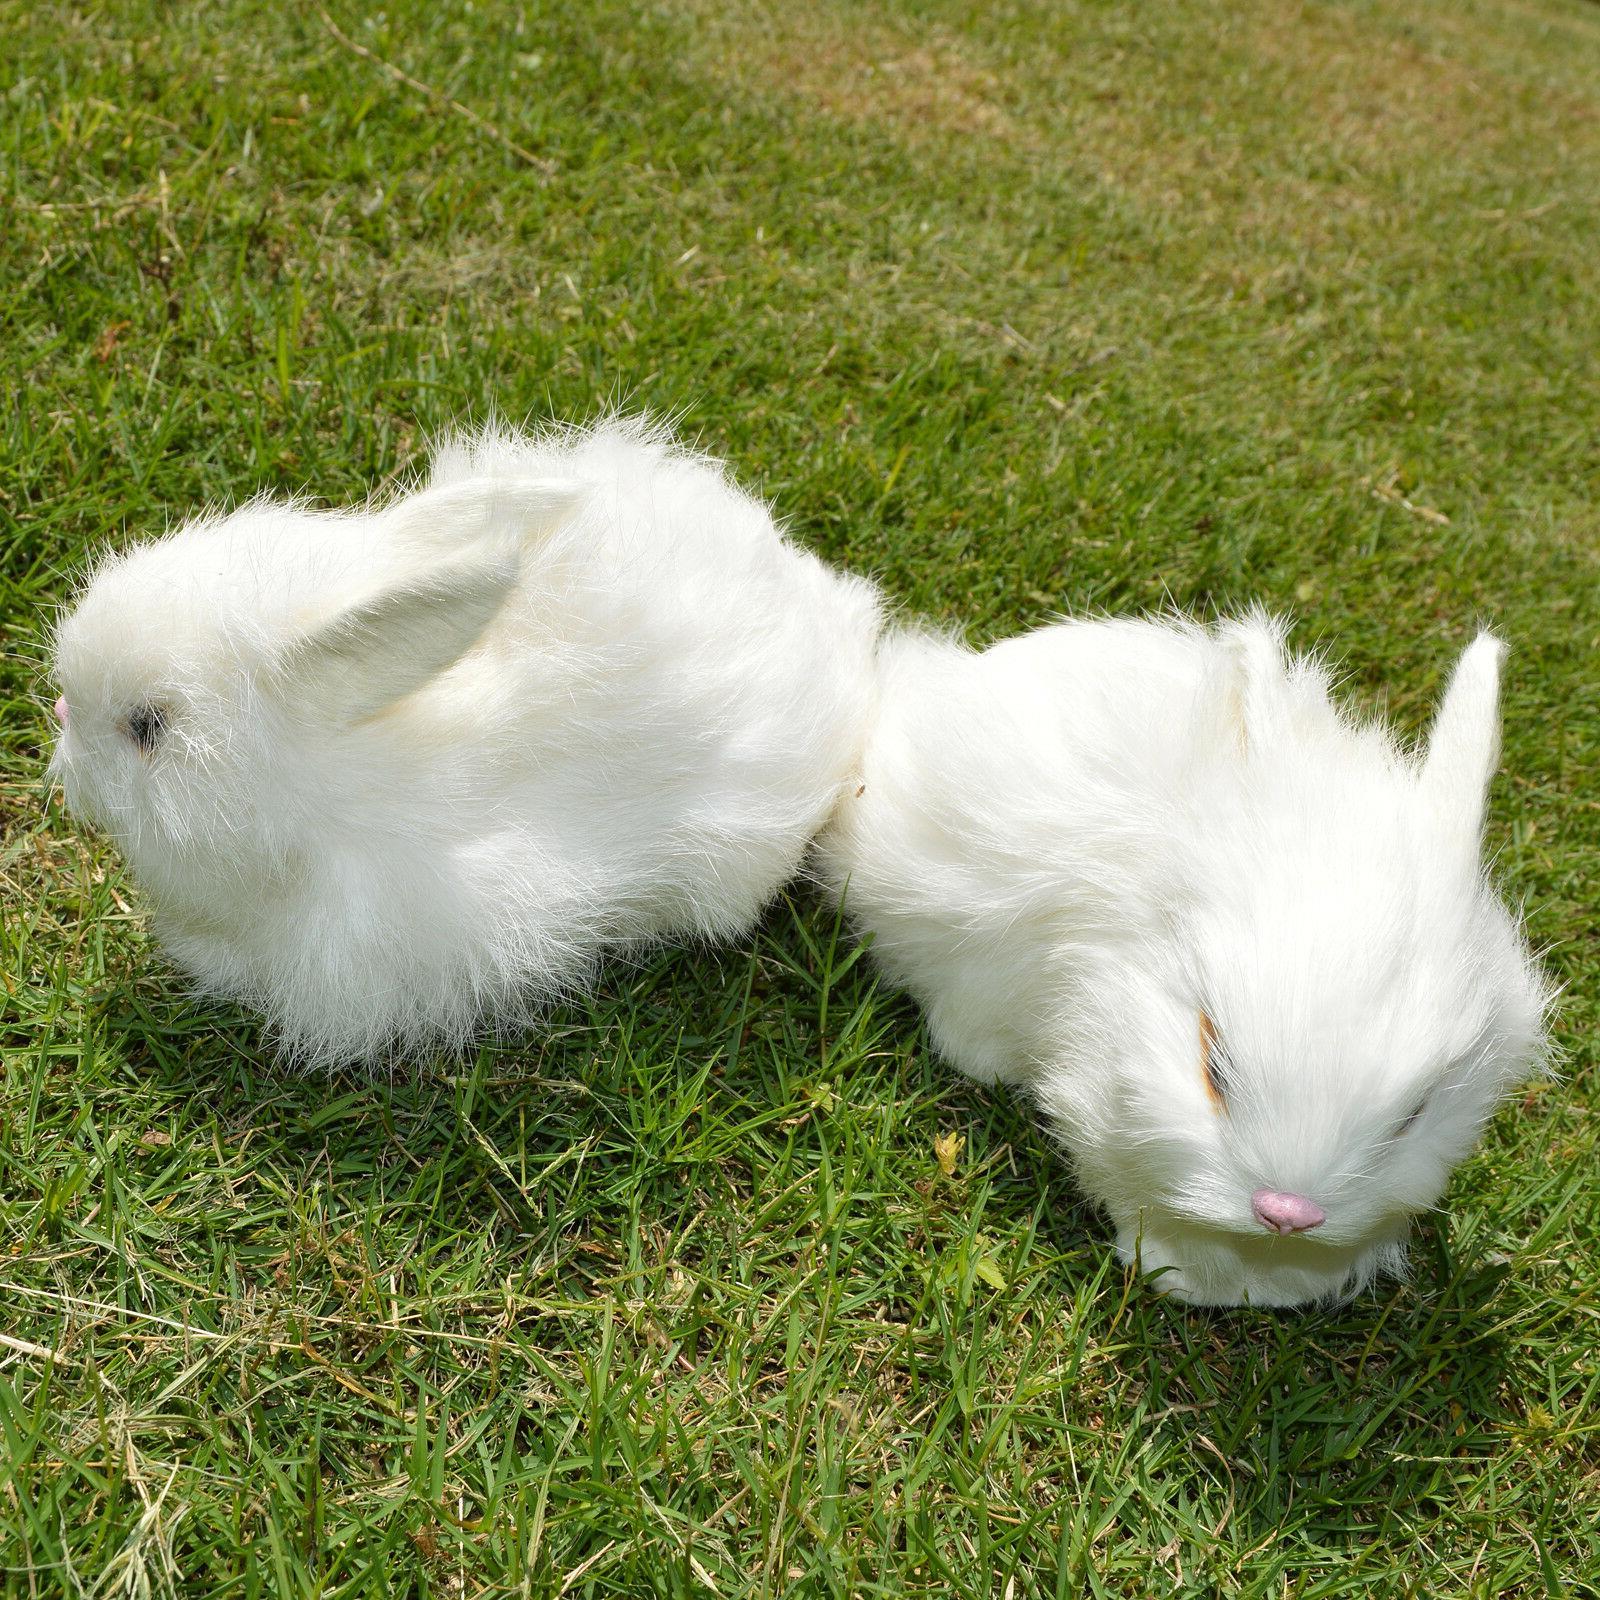 2 x Realistic White Plush Fur Lifelike Animal Bunnies